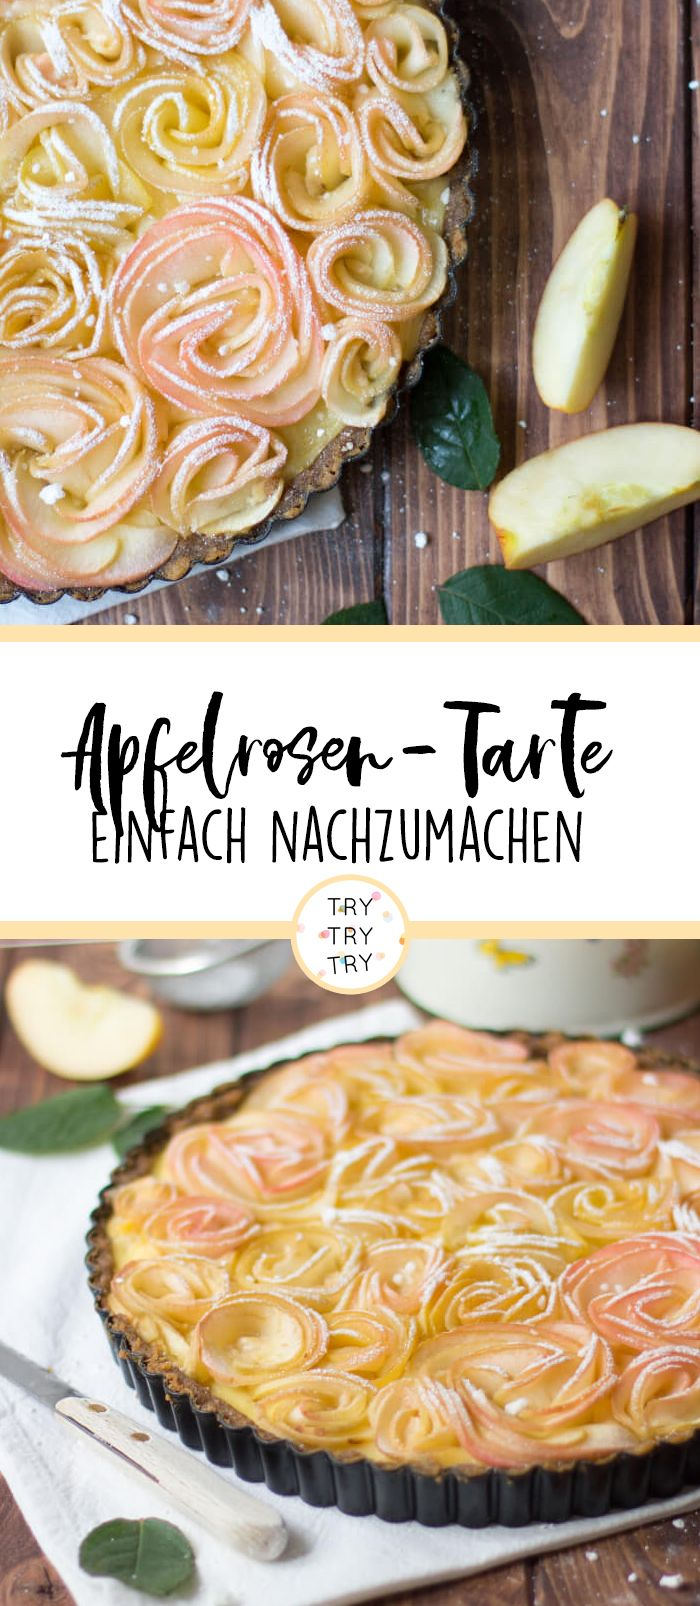 Apfelrosen Tarte #apfelrosenblätterteig